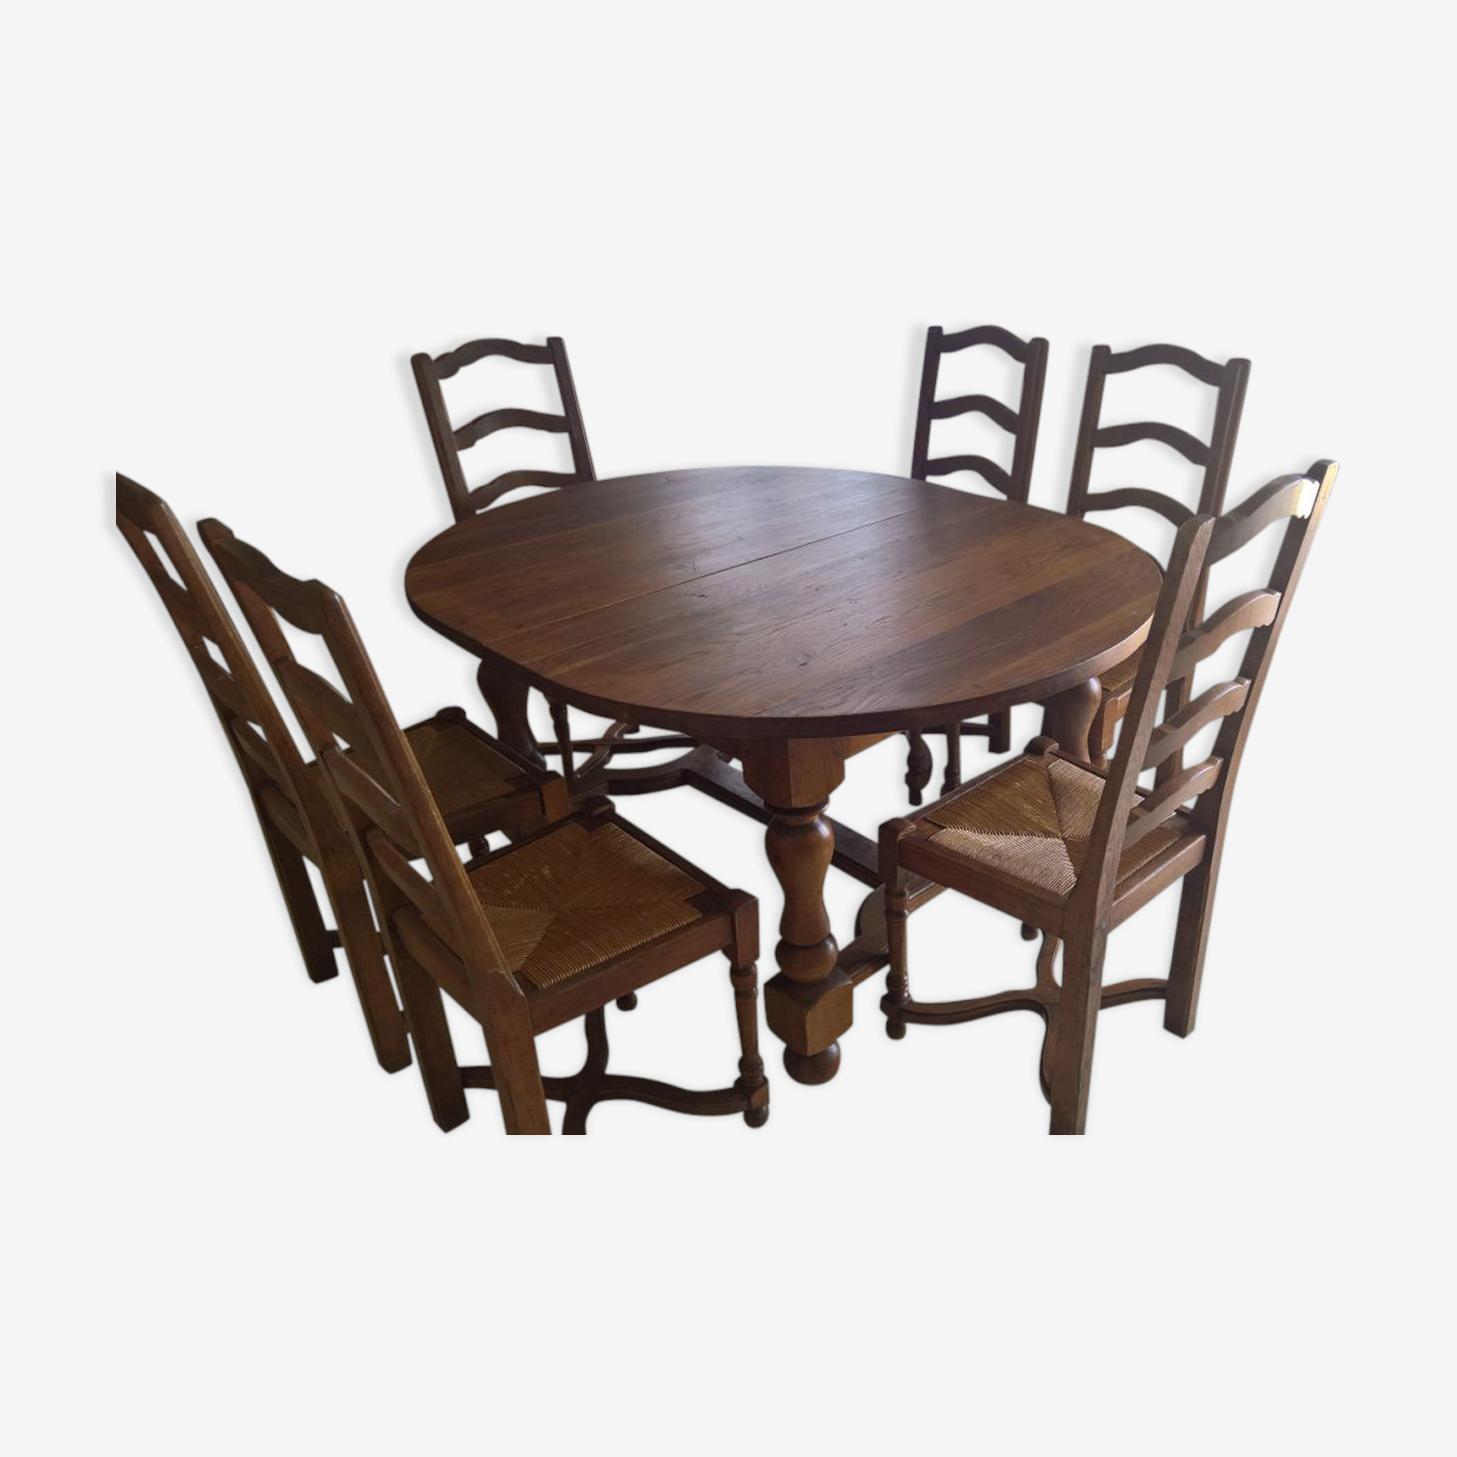 Table Ovale Chene Massif Avec Rallonges Bois Materiau Bois